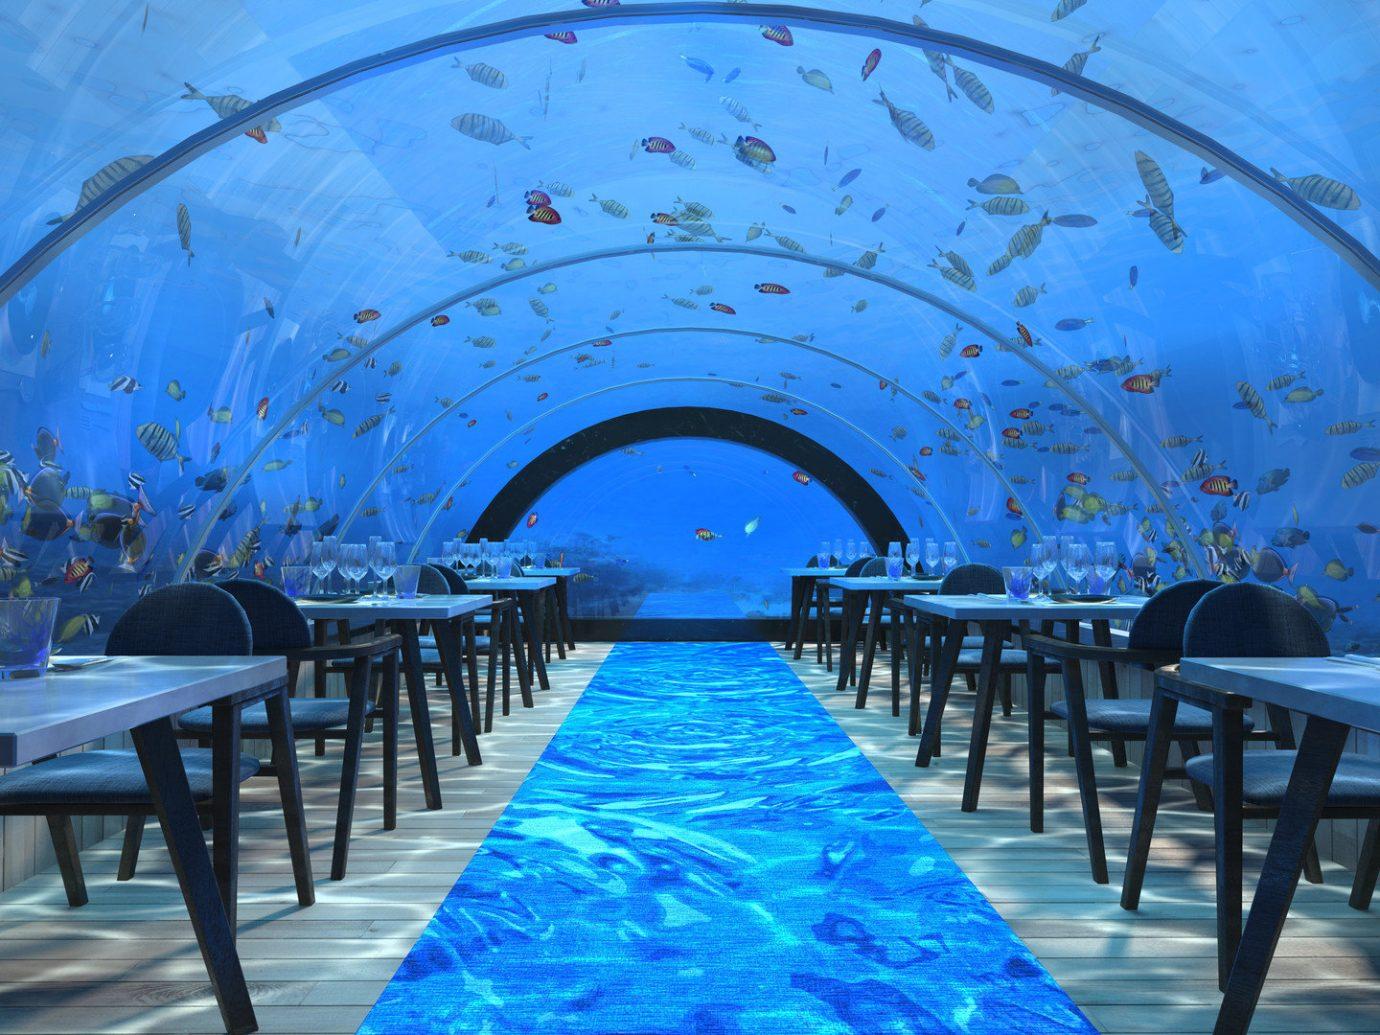 Hotels blue Pool restaurant